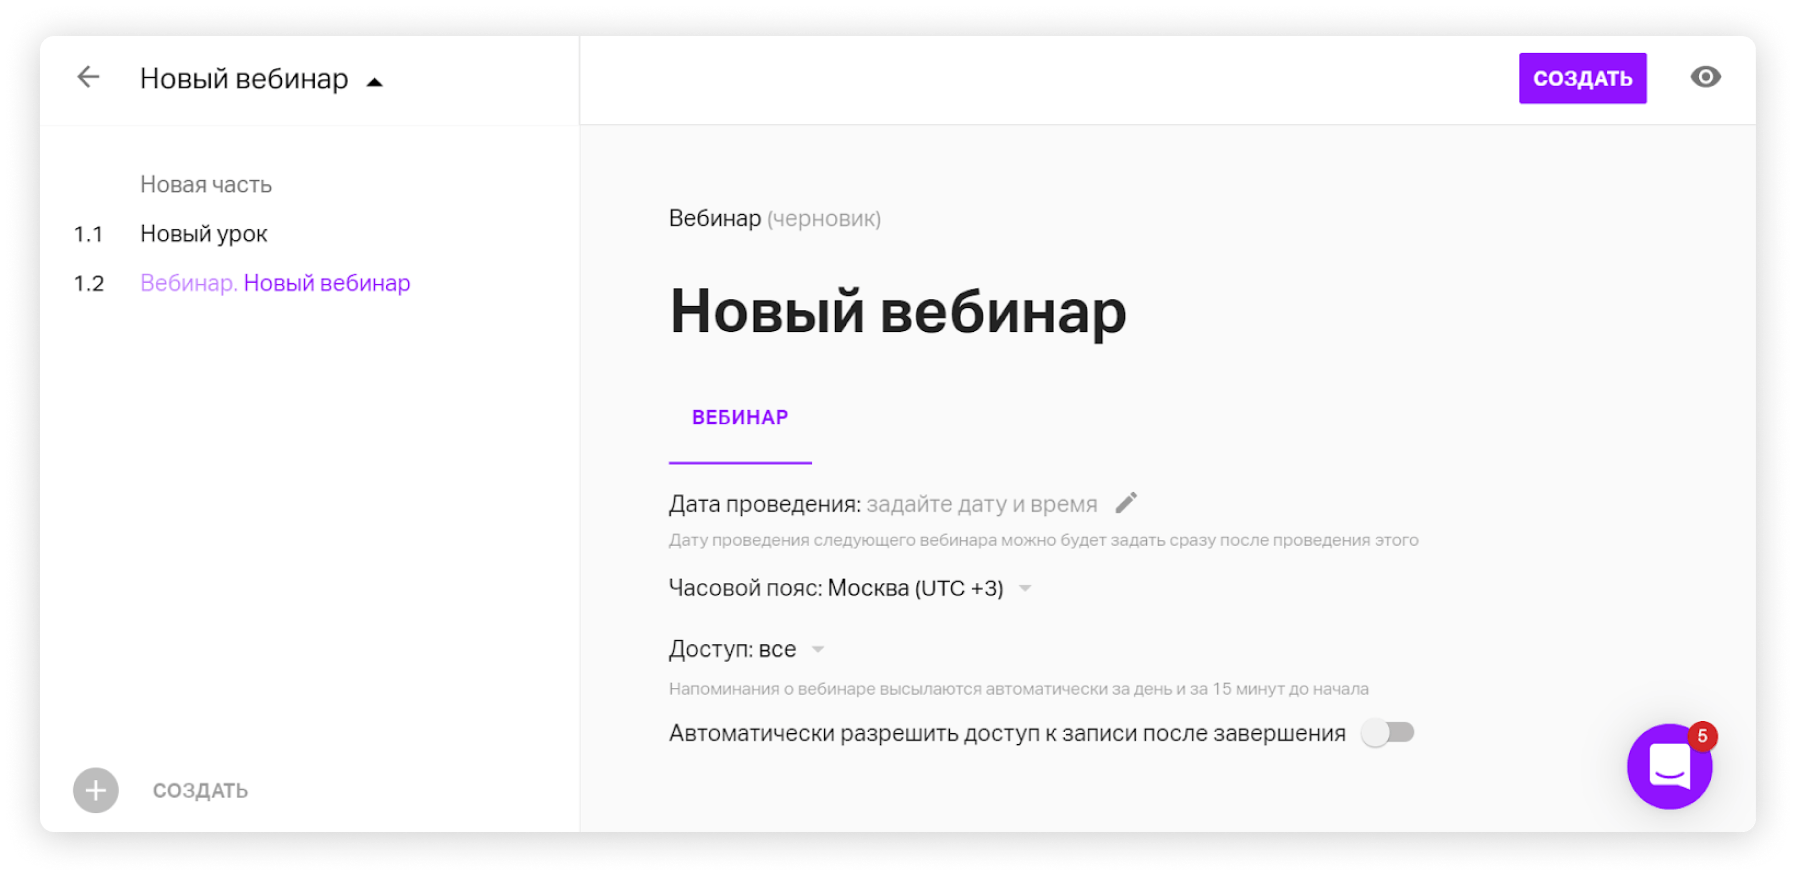 novy_webinar